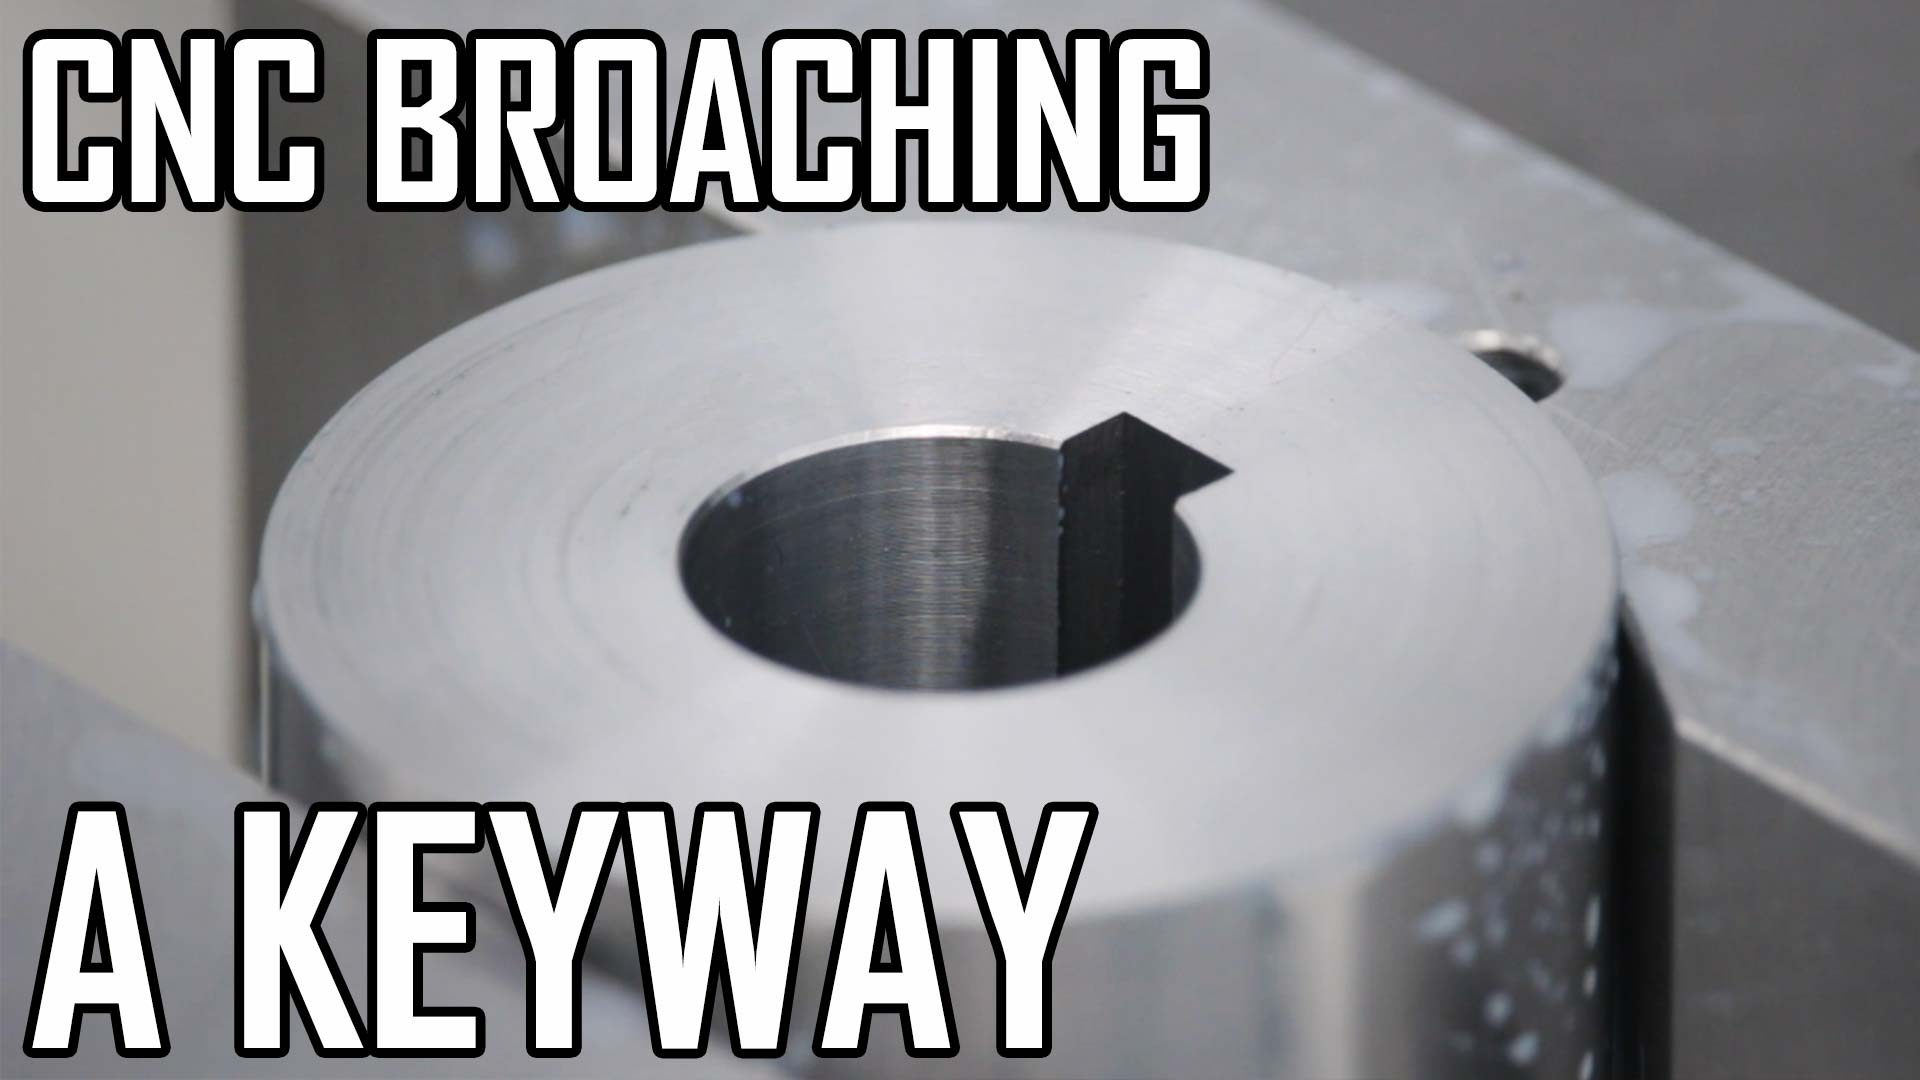 Diamond Grinder Part 4: CNC Broaching a Keyway